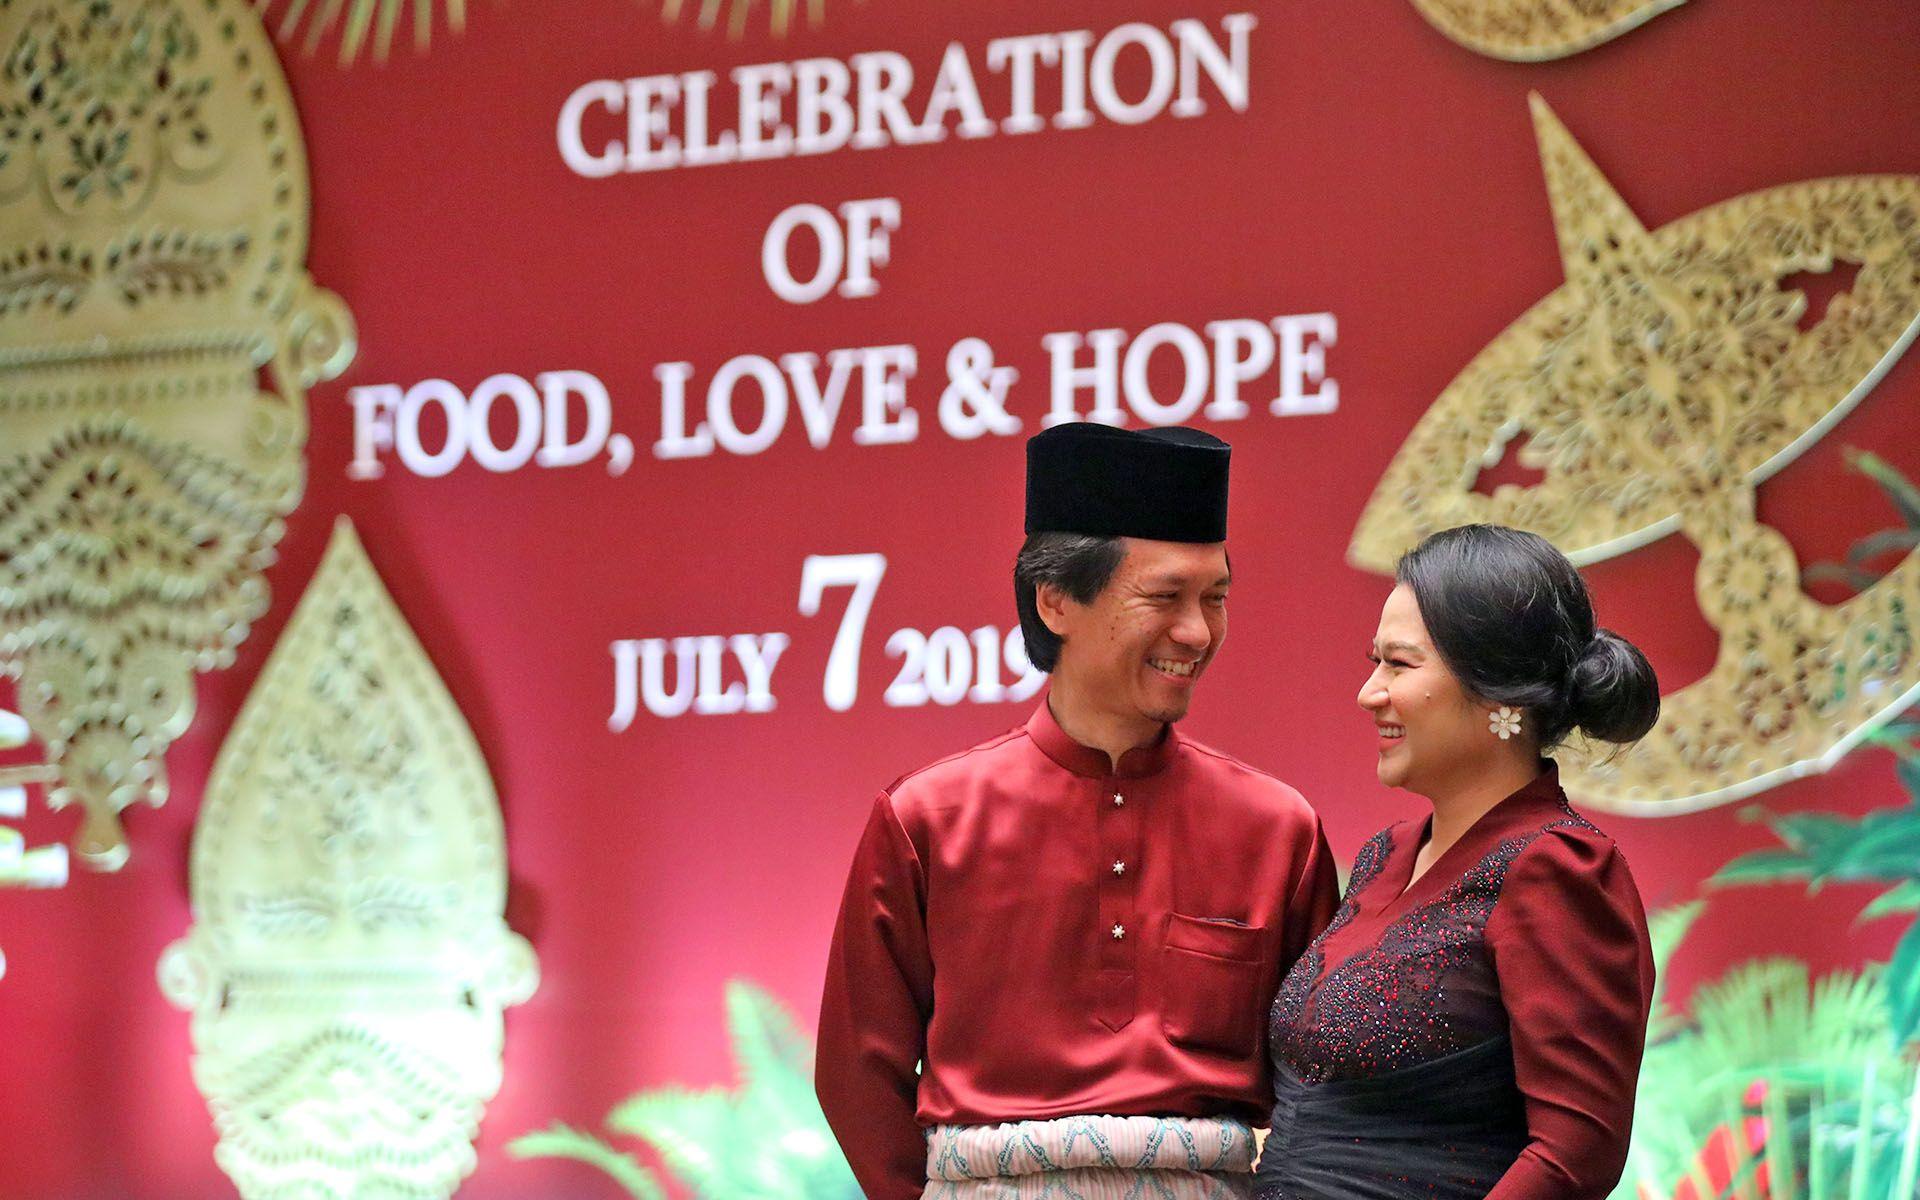 Datuk Mohd Omar Mustapha and Dato' Sri Rozita Ramelan